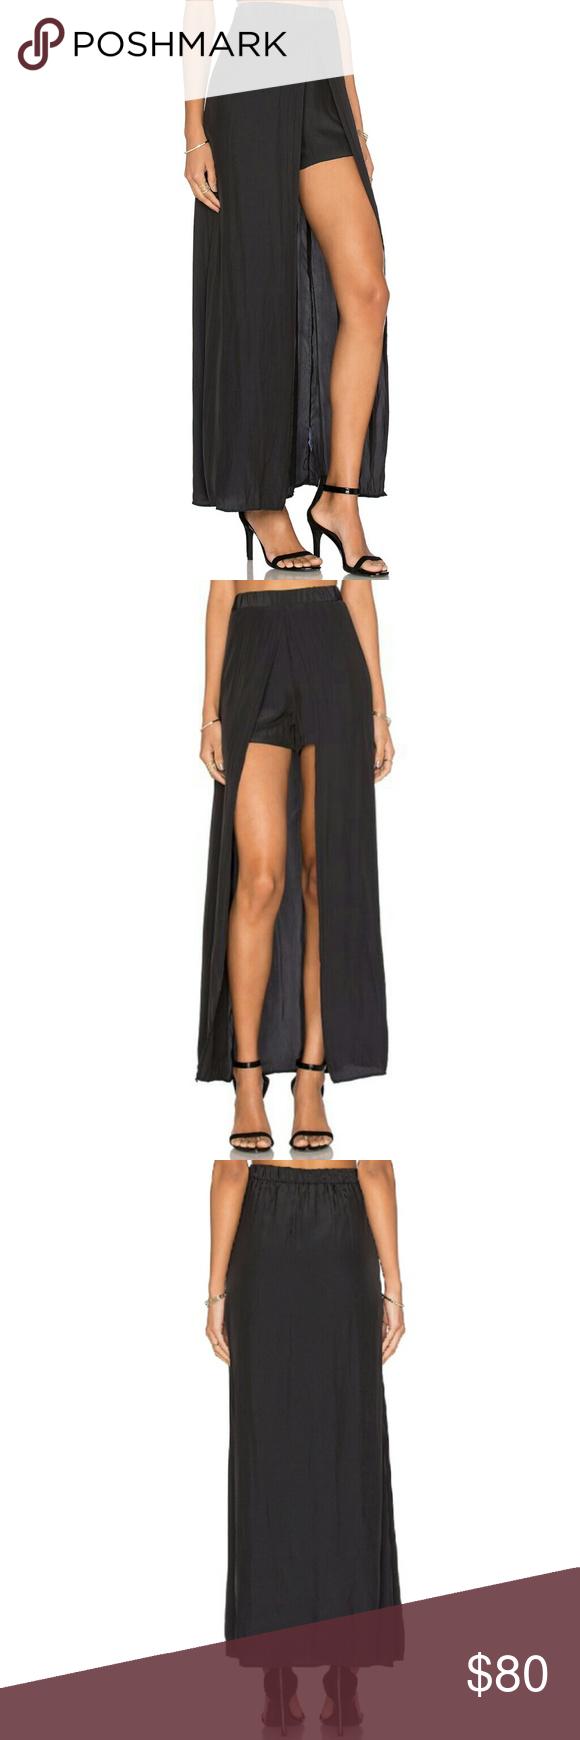 New ella moss black maxi skirt with shorts boutique black maxi